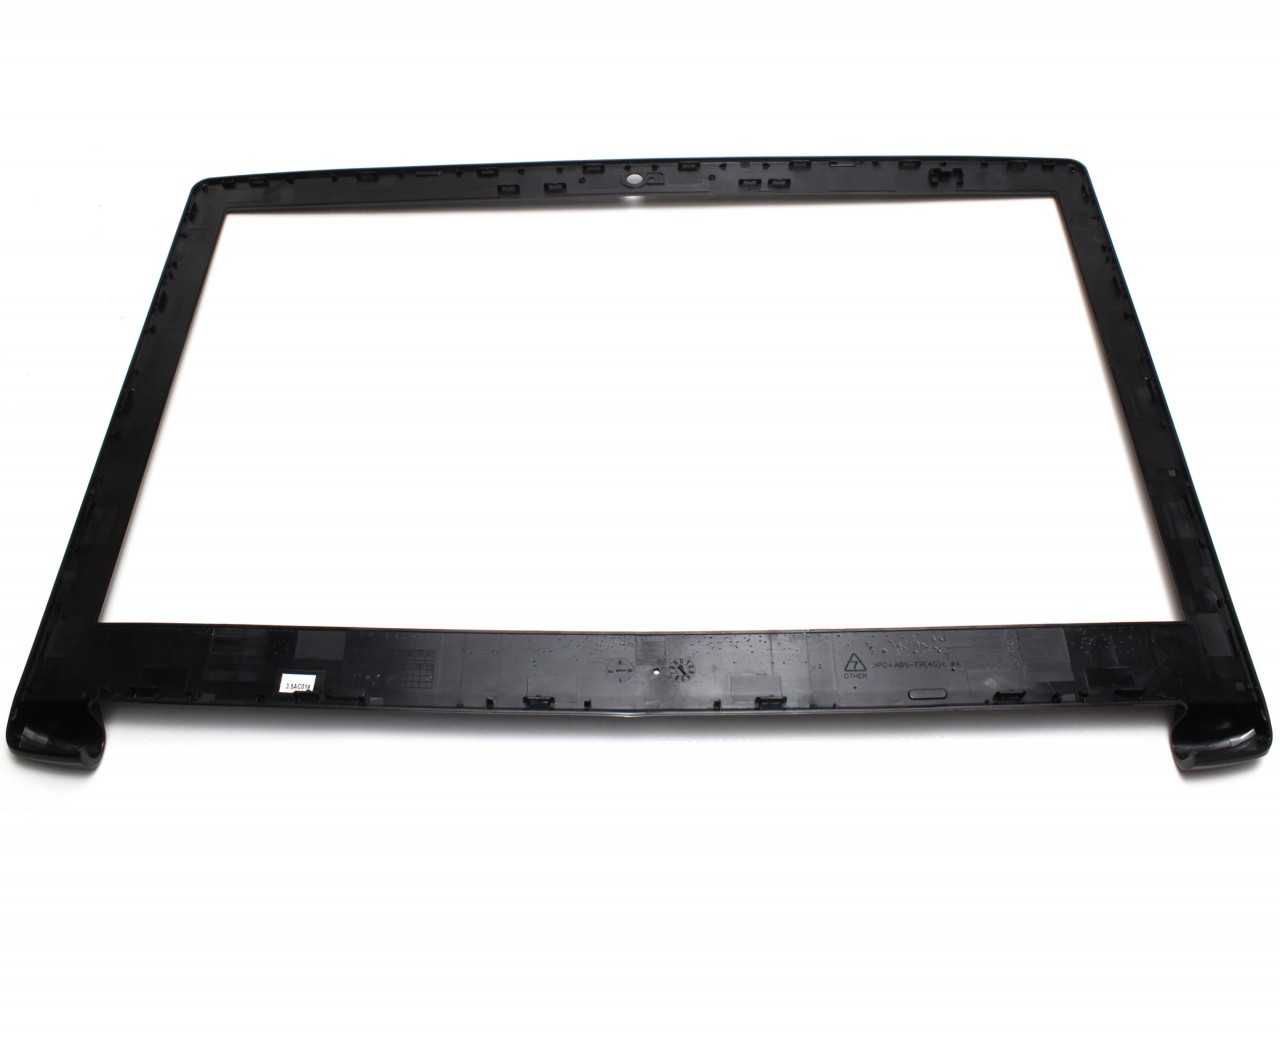 Rama Display Acer Aspire 3 A315-33 Bezel Front Cover Neagra imagine powerlaptop.ro 2021